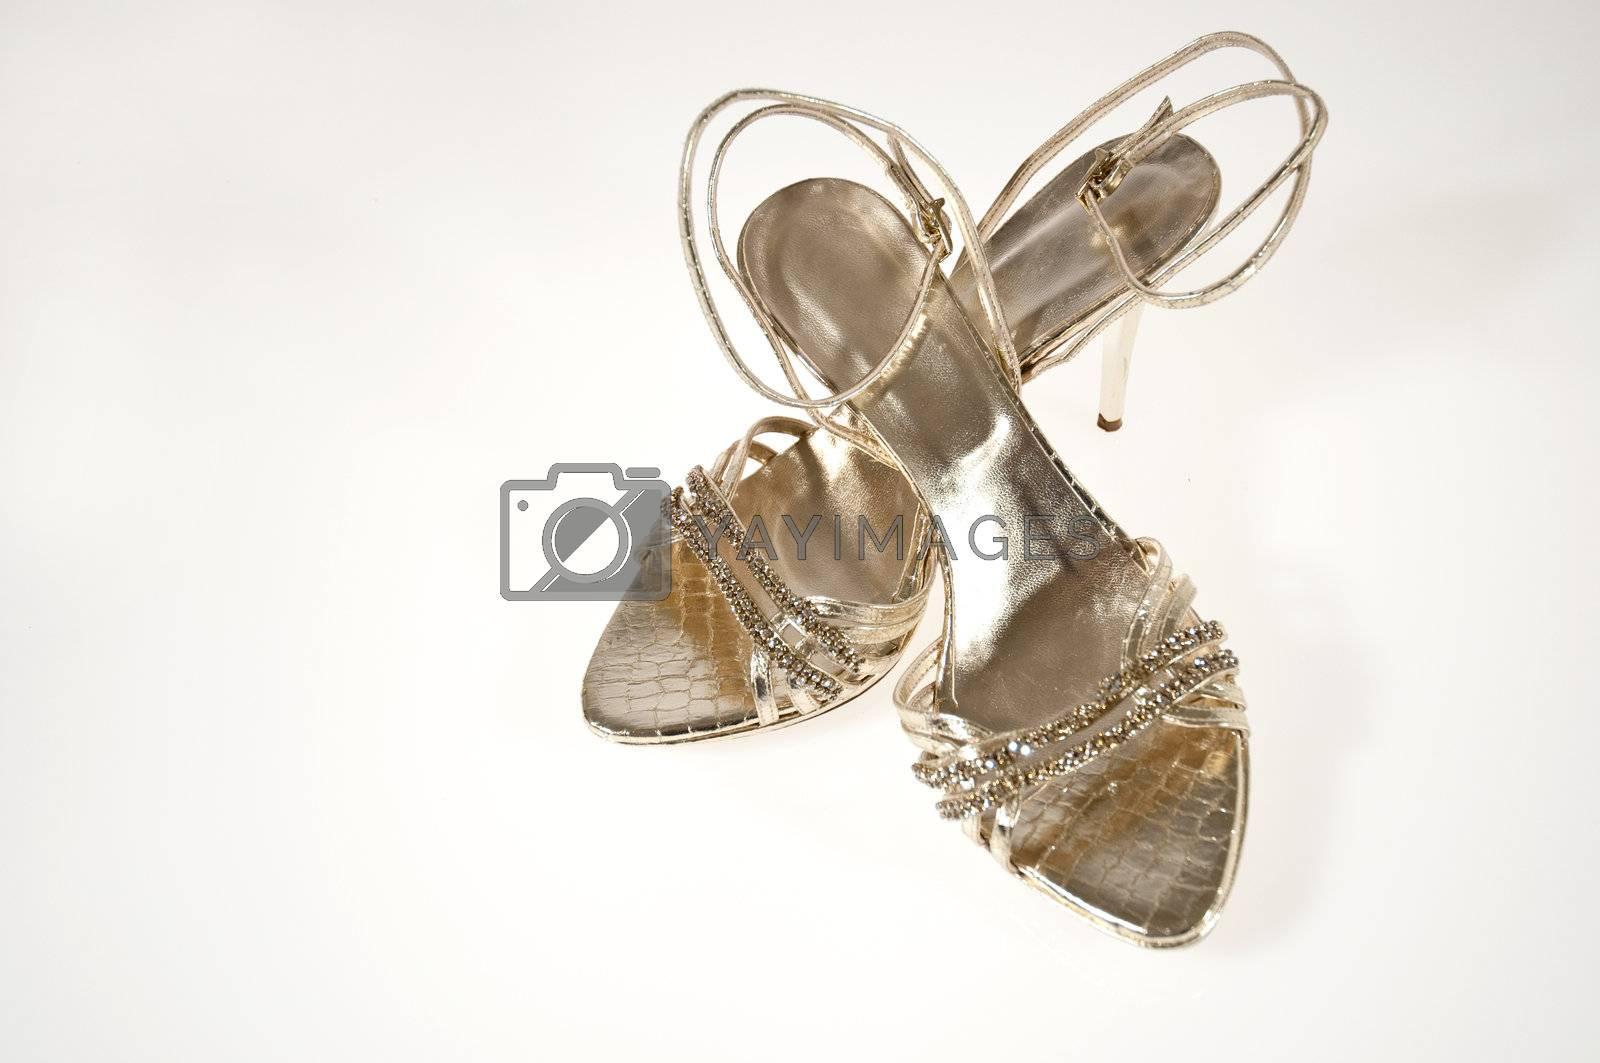 A pair of golden sandals women's Rhinestone